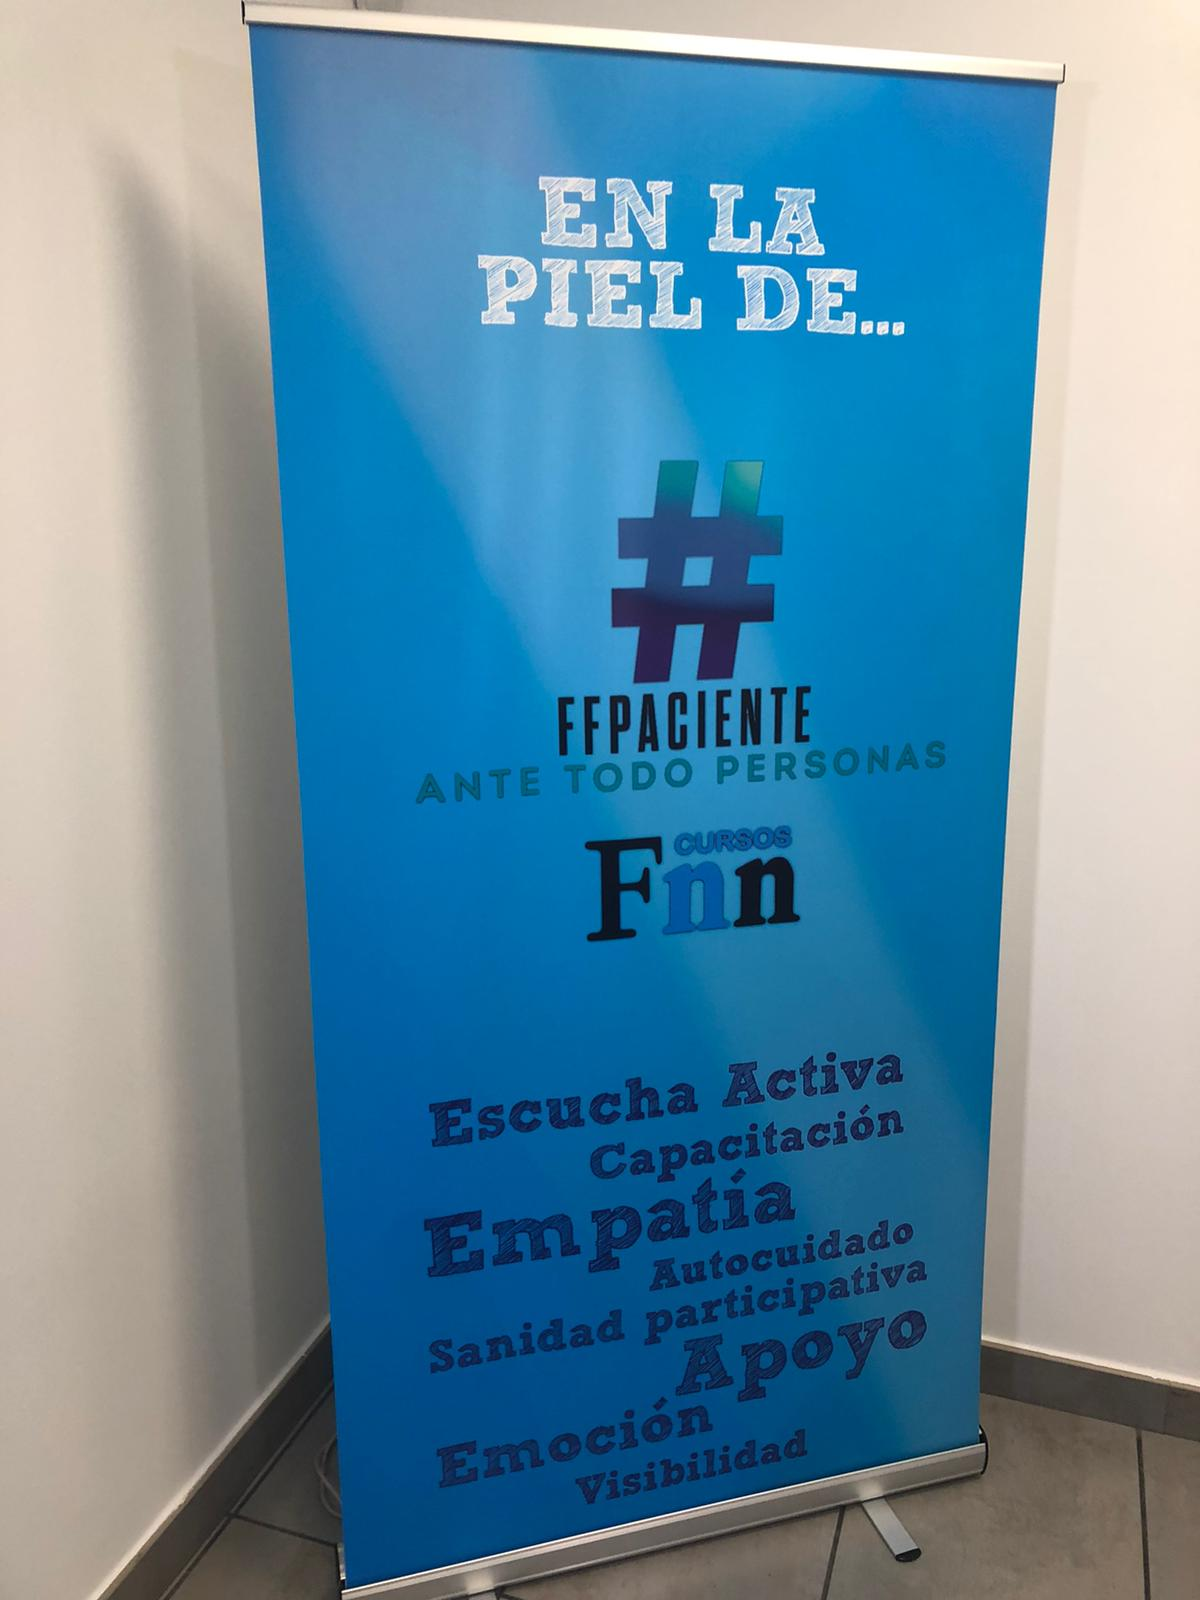 #FFPaciente firma un convenio de colaboración con CursosFNN.